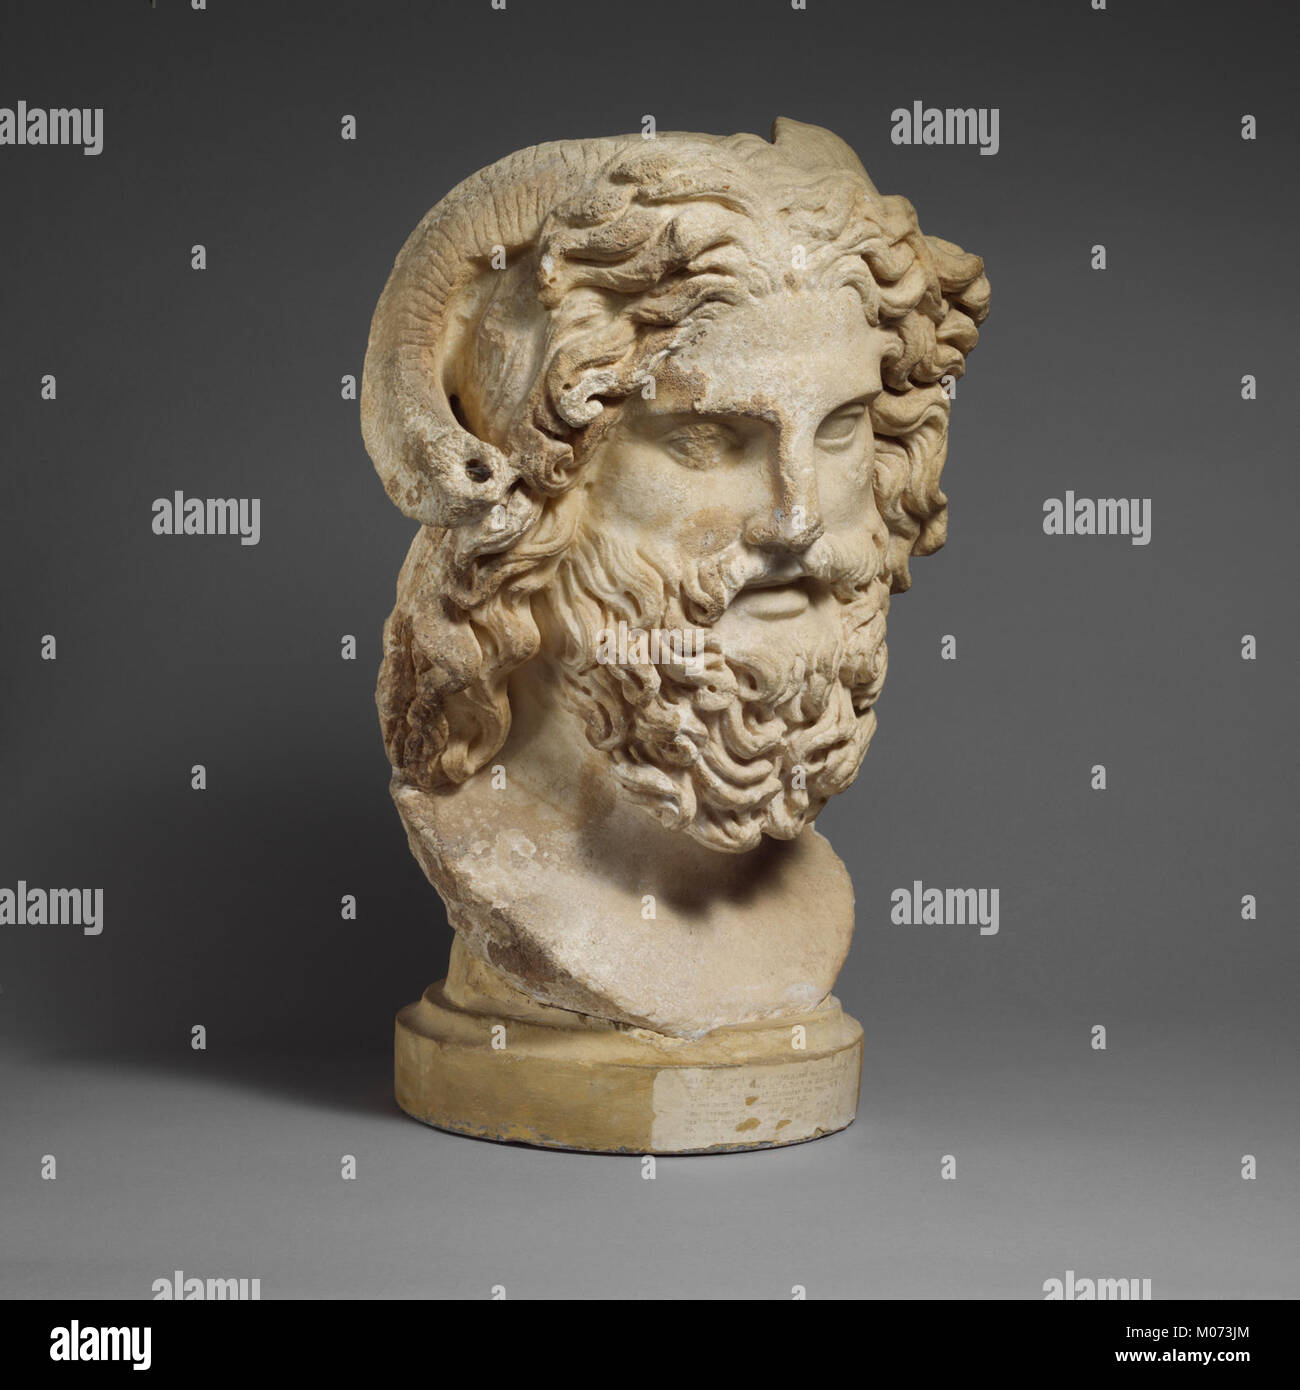 Zeus site de rencontre